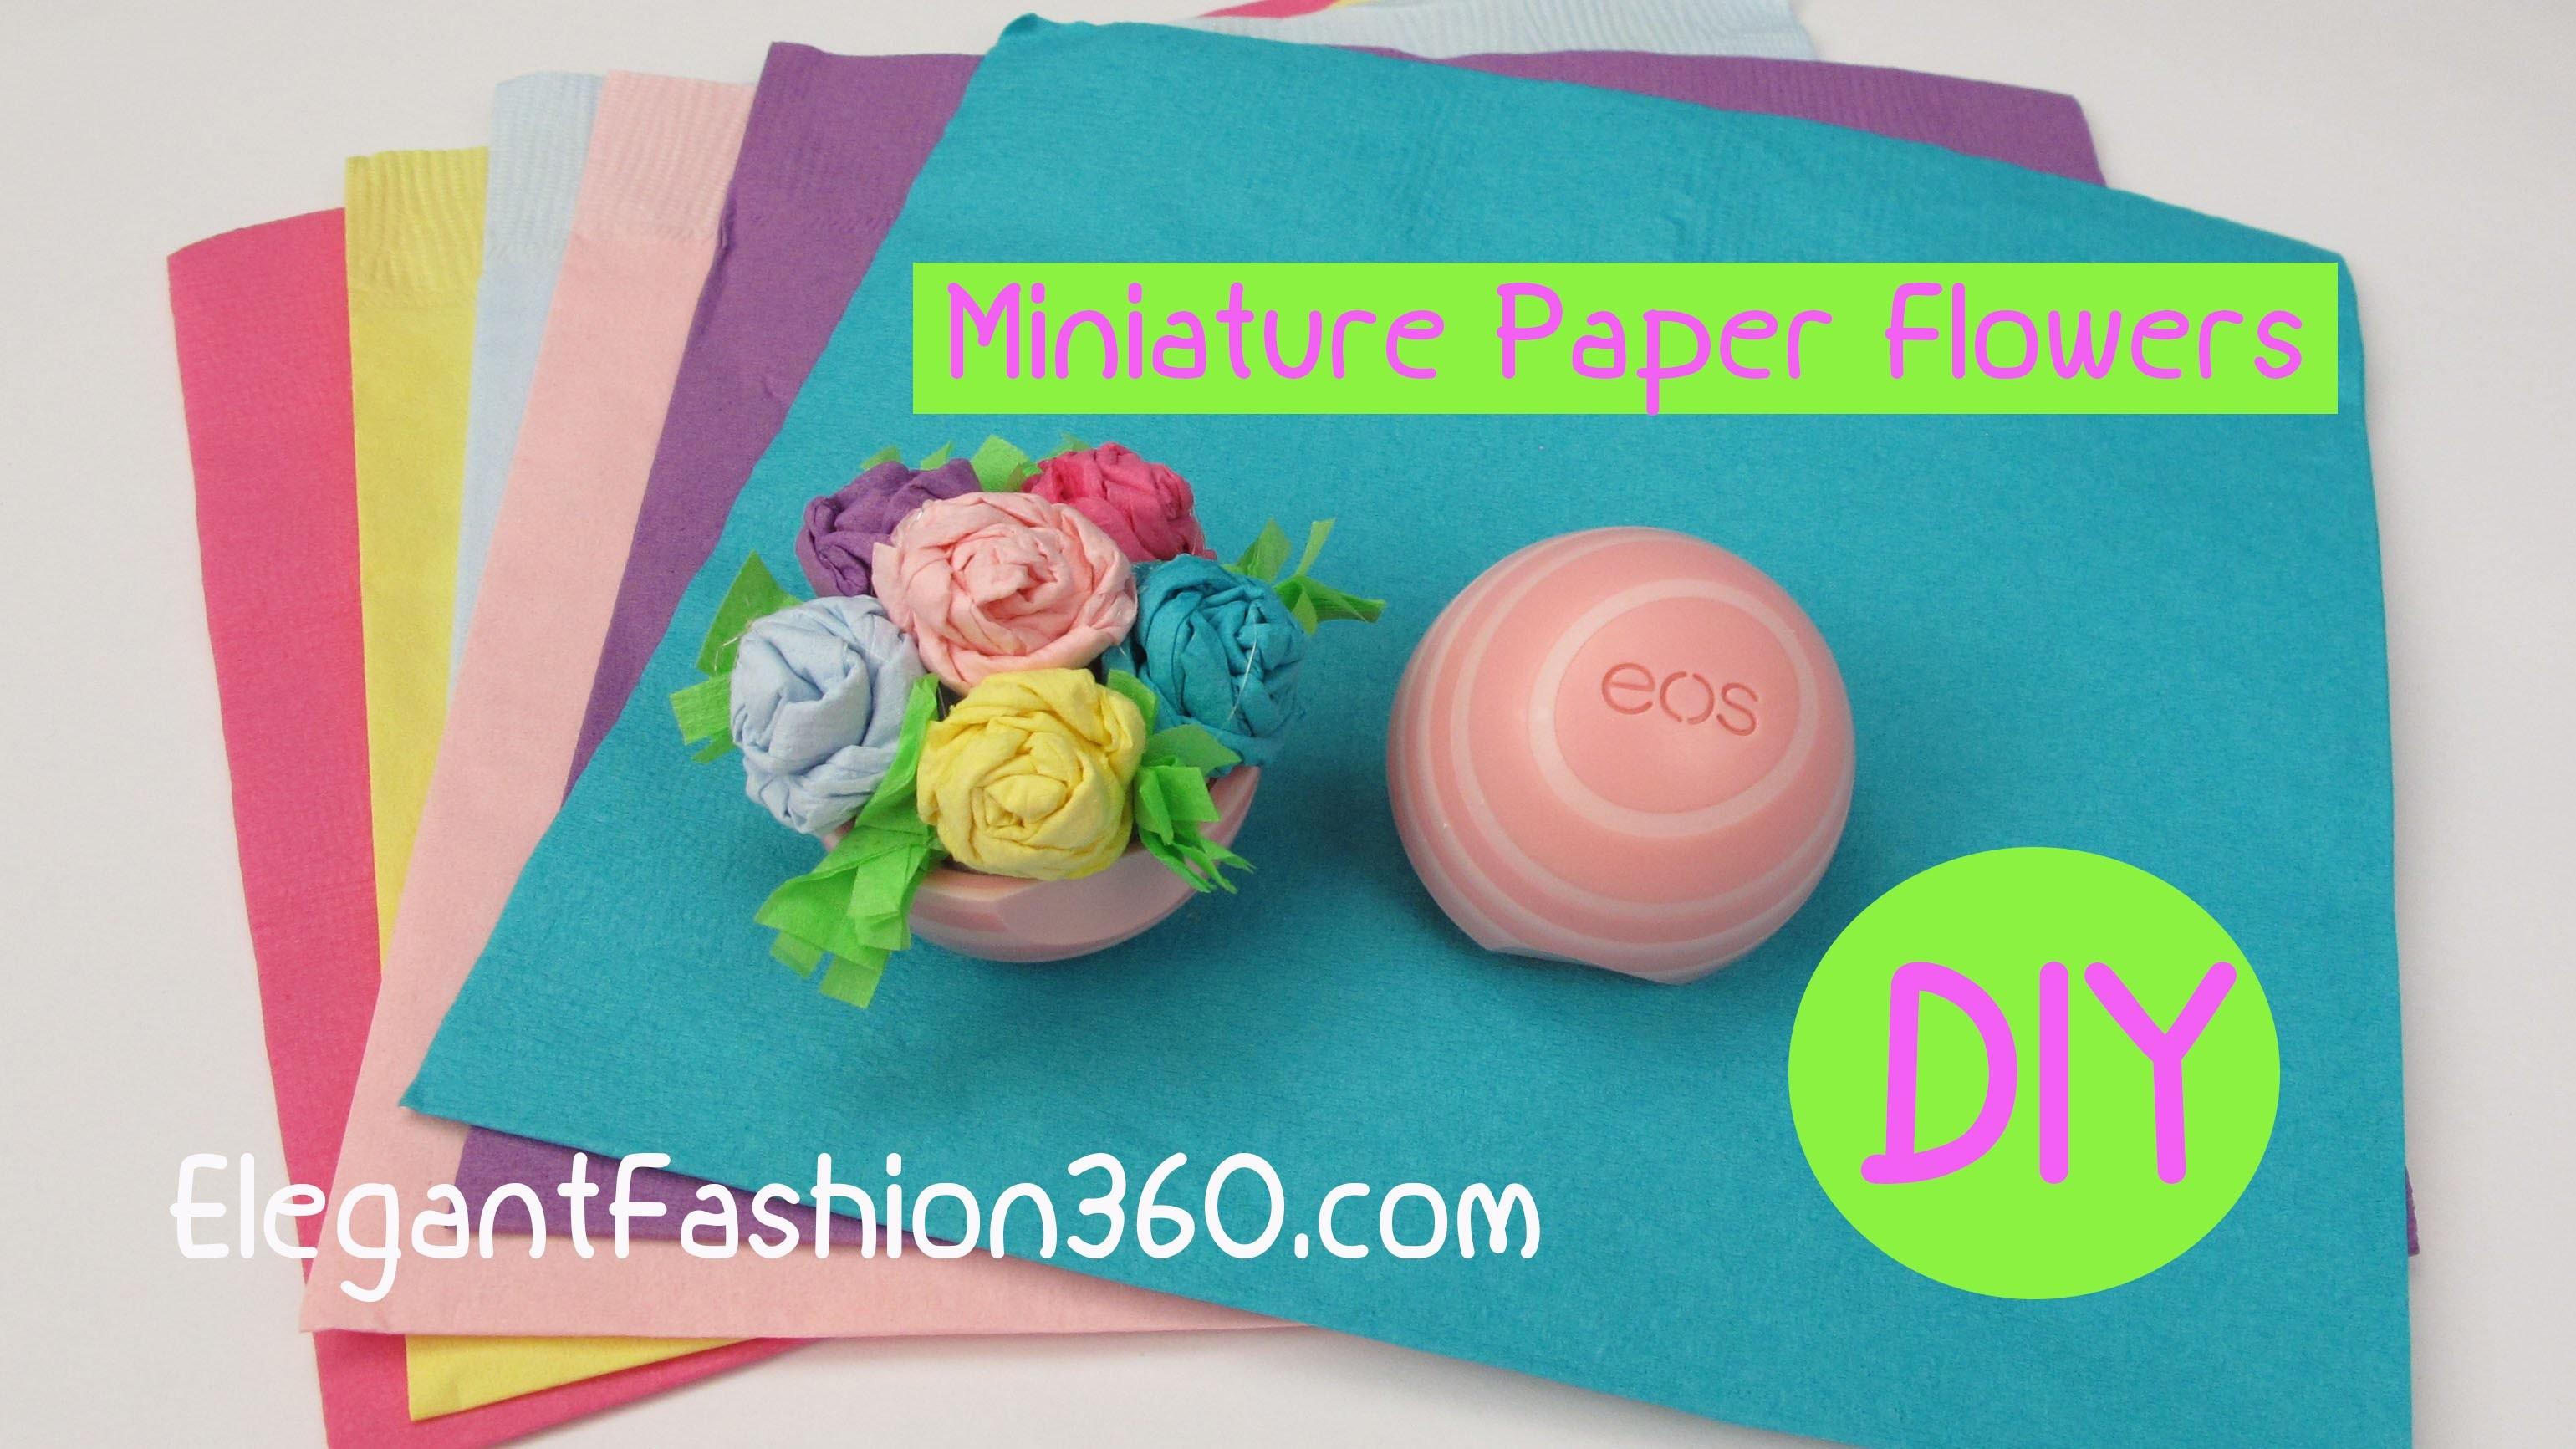 How to Make EOS Miniature Paper Flower Bouquet.Dollhouse Valentine's Gift Idea Craft Tutorial